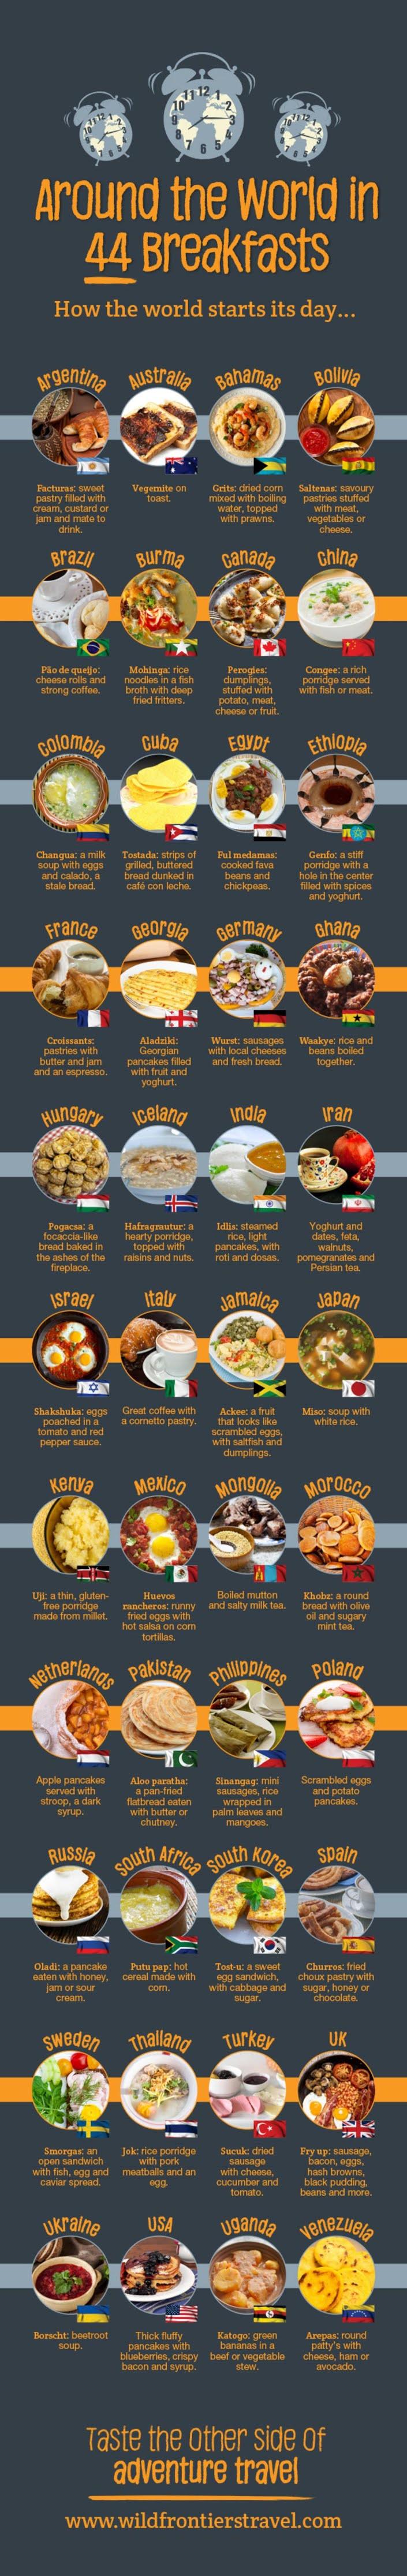 Around The World In 44 Breakfast  #infographic #Food #Breakfast #World